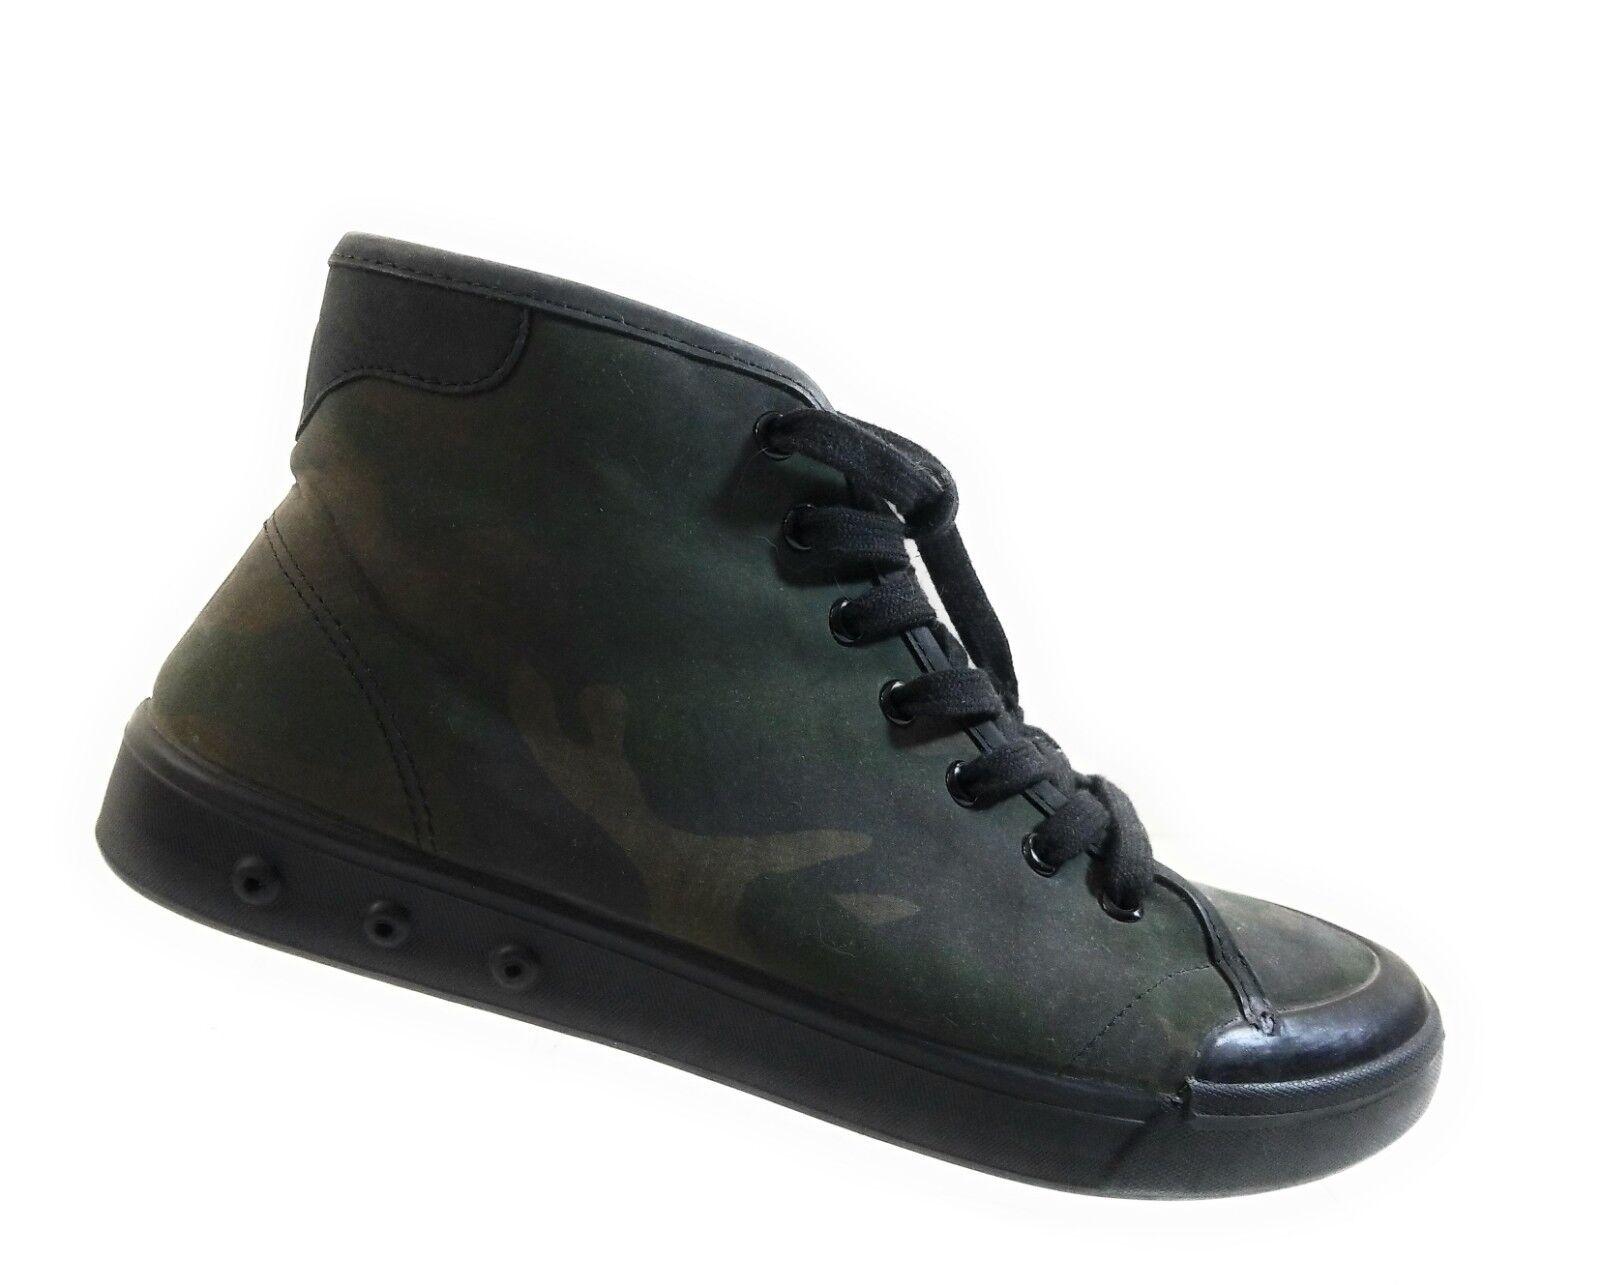 Rag & Bone Men High Top Khaki Dark Green Fashion Sneakers Lace Up shoes Sz 42.5